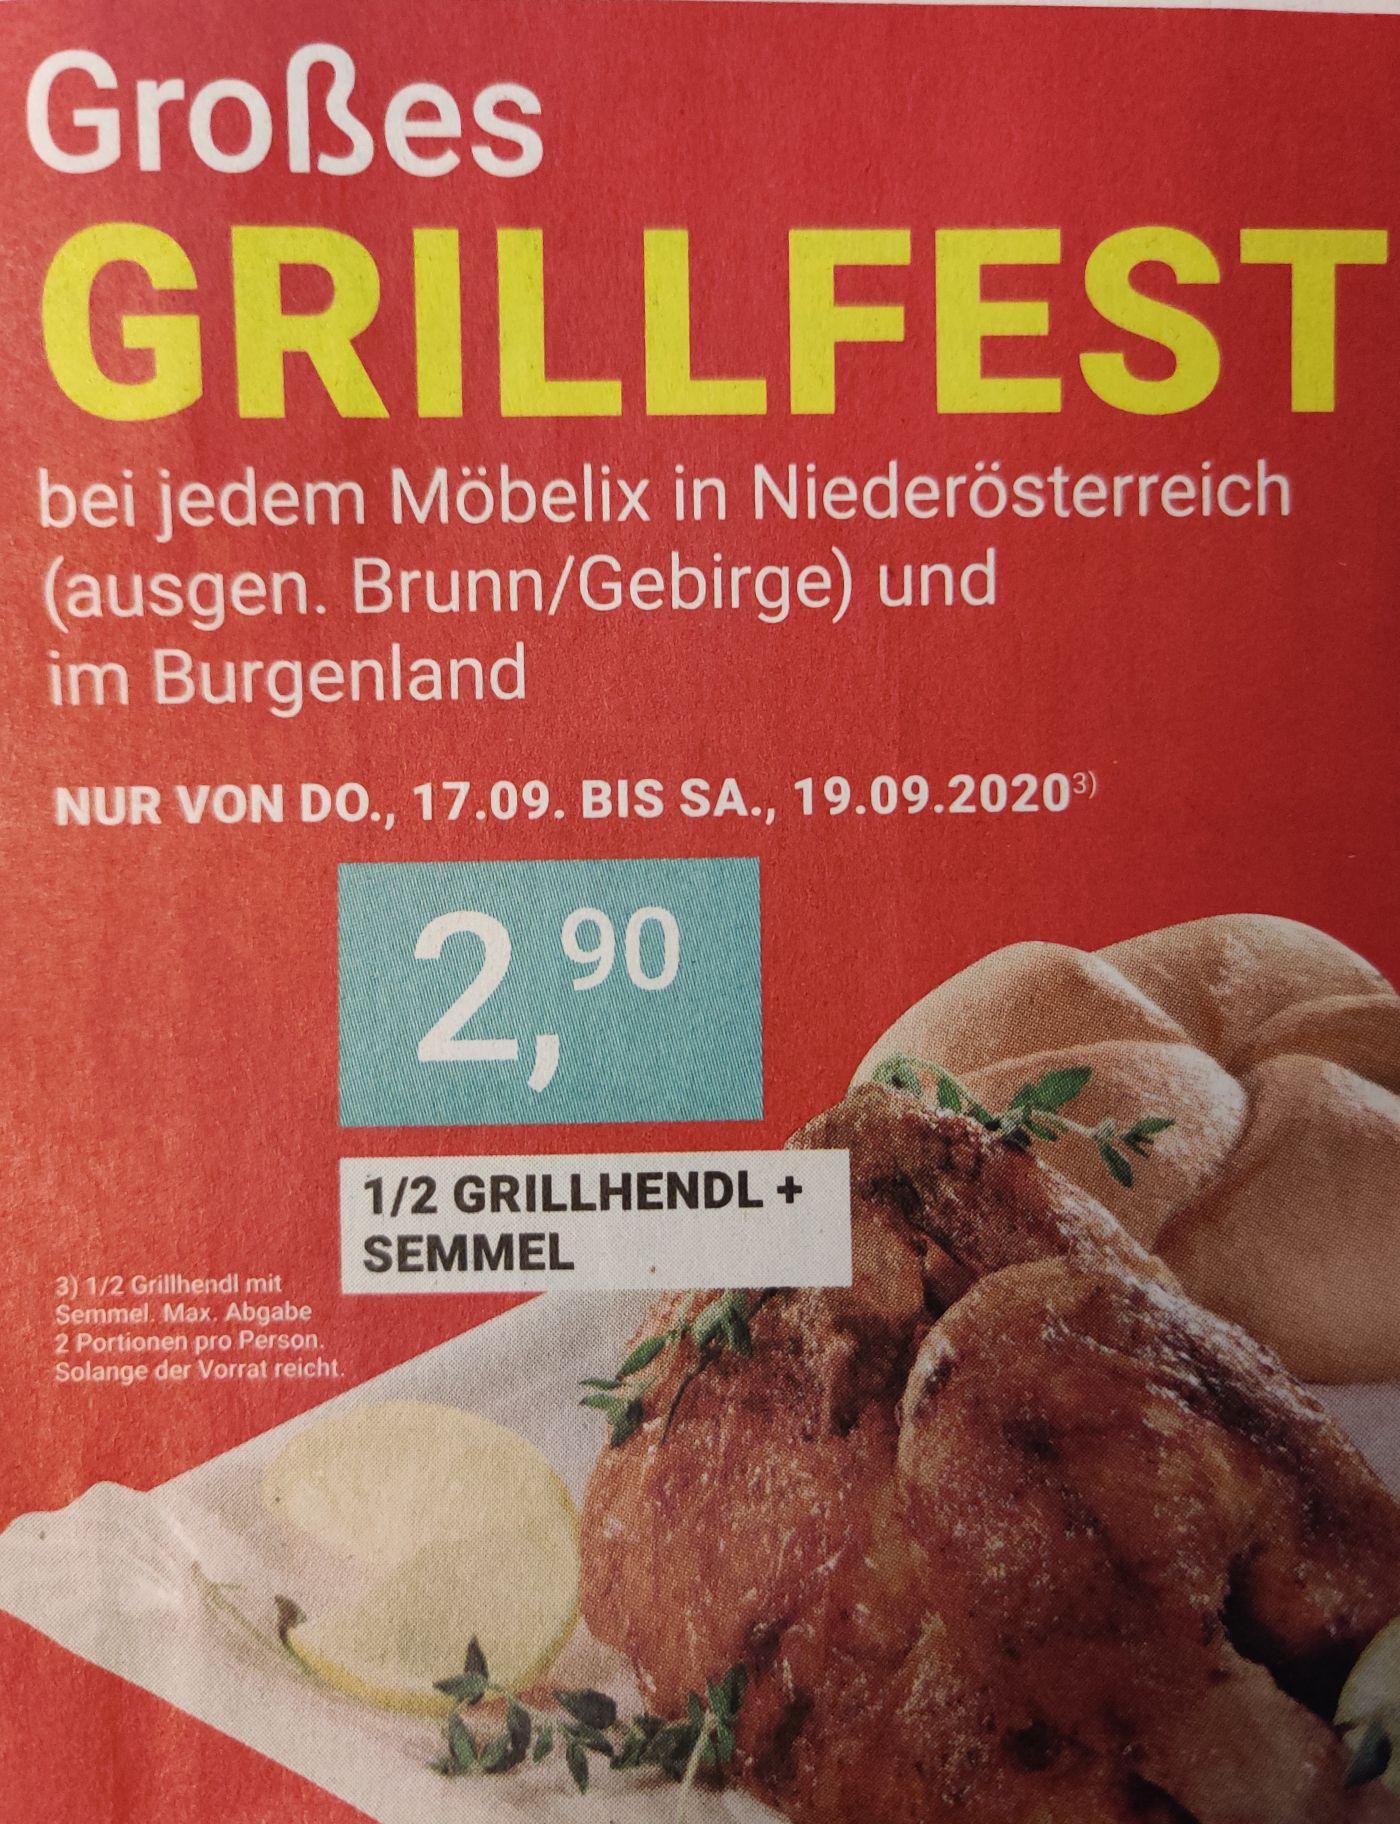 [Möbelix] 1/2 Grillhendl + Semmel um 2,90€